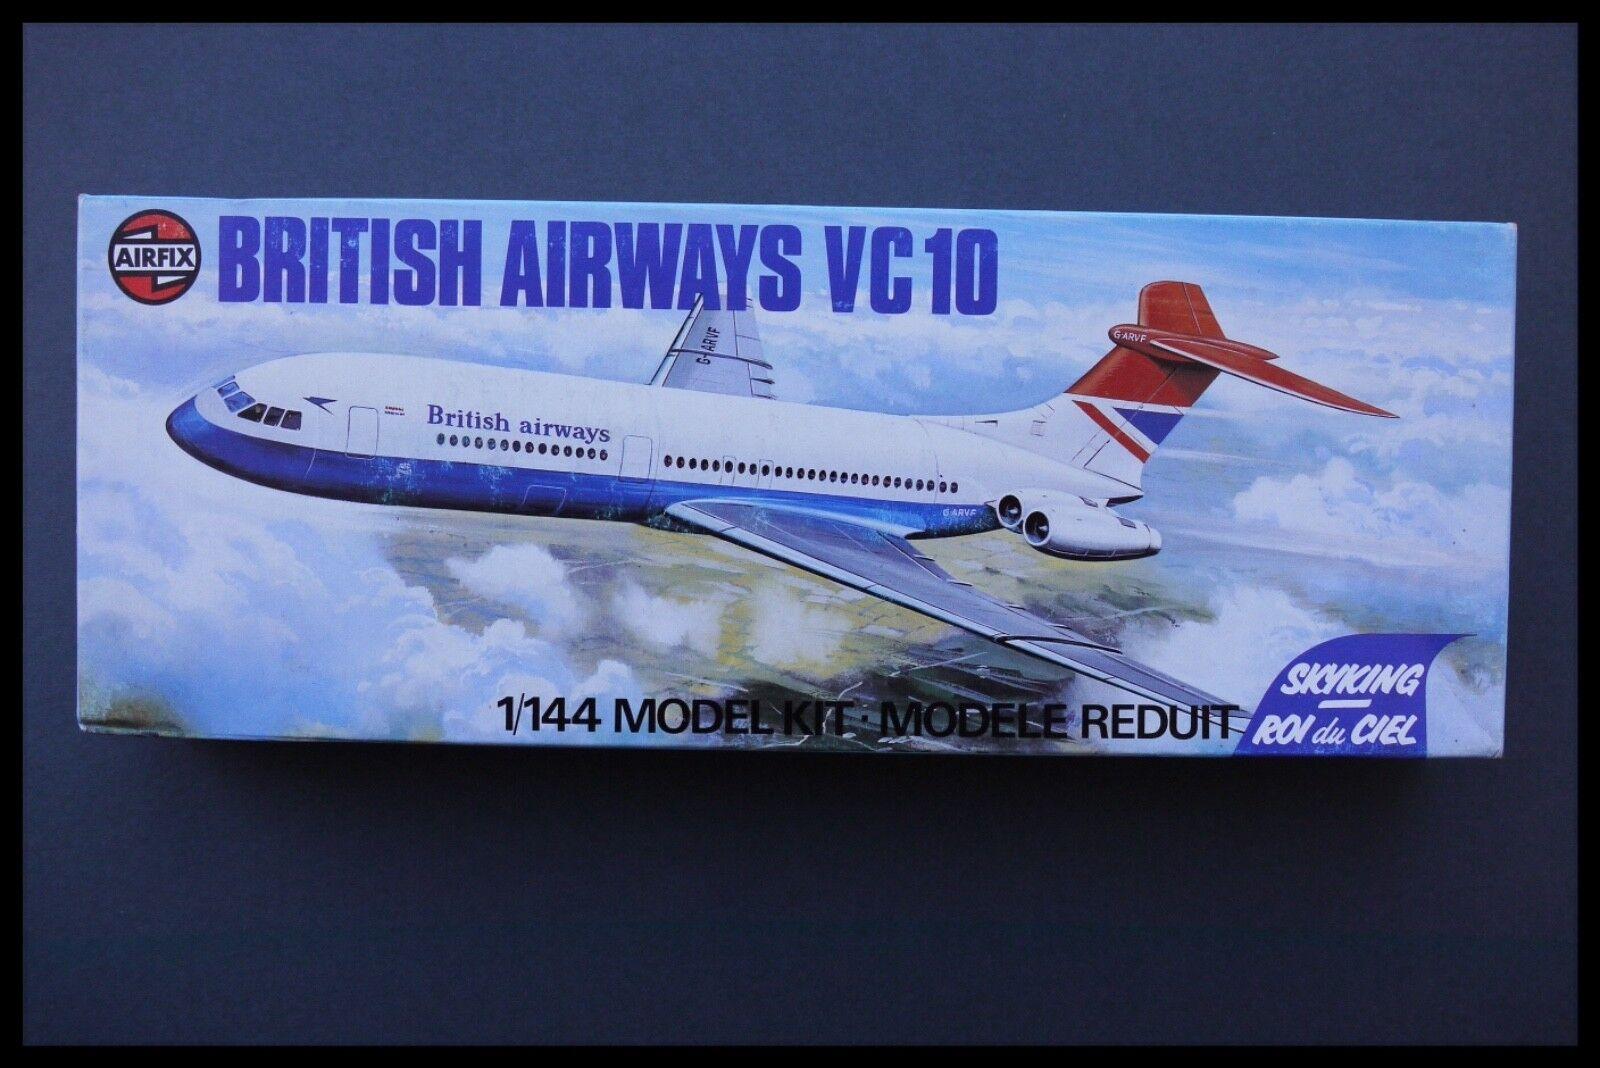 VINTAGE AIRFIX BRITISH AIRWAYS VC10 1 144 SCALE PLASTIC MODEL KIT SEALED BAG